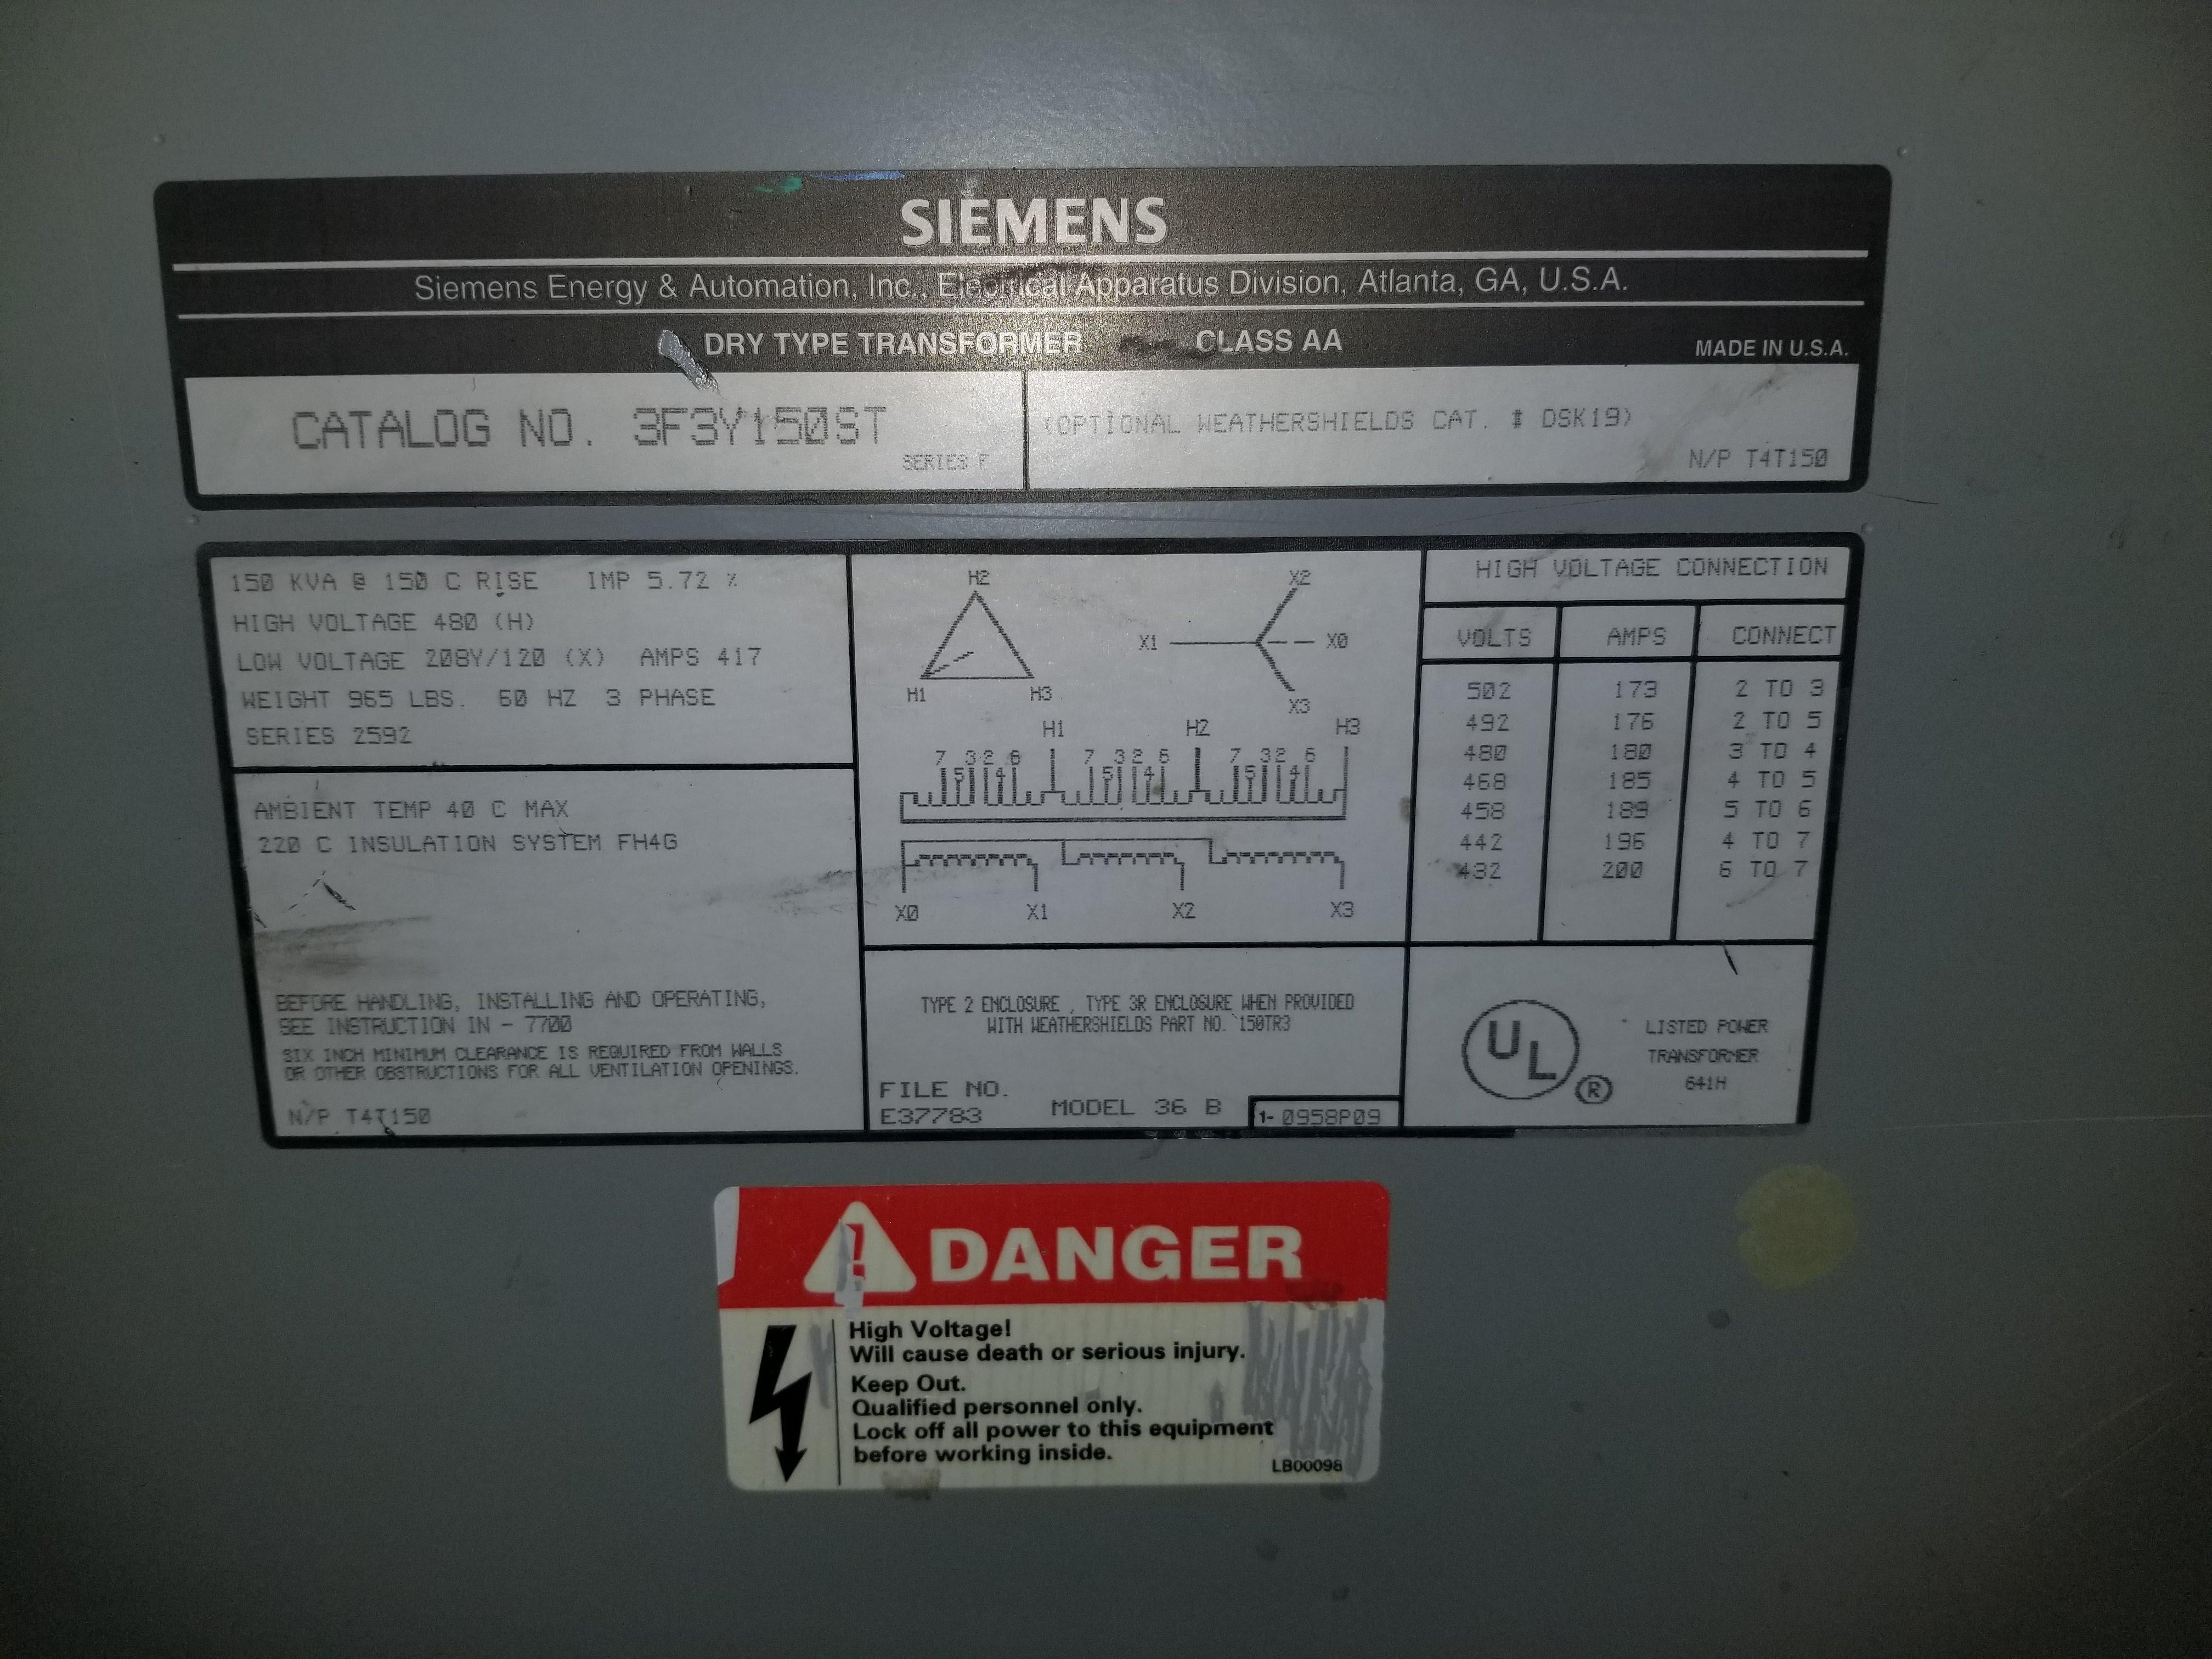 Lot 22 - Siemens Dry Type Transformer 150 KVA, Catalog 3F3Y150ST, Primary voltage (480V), secondary